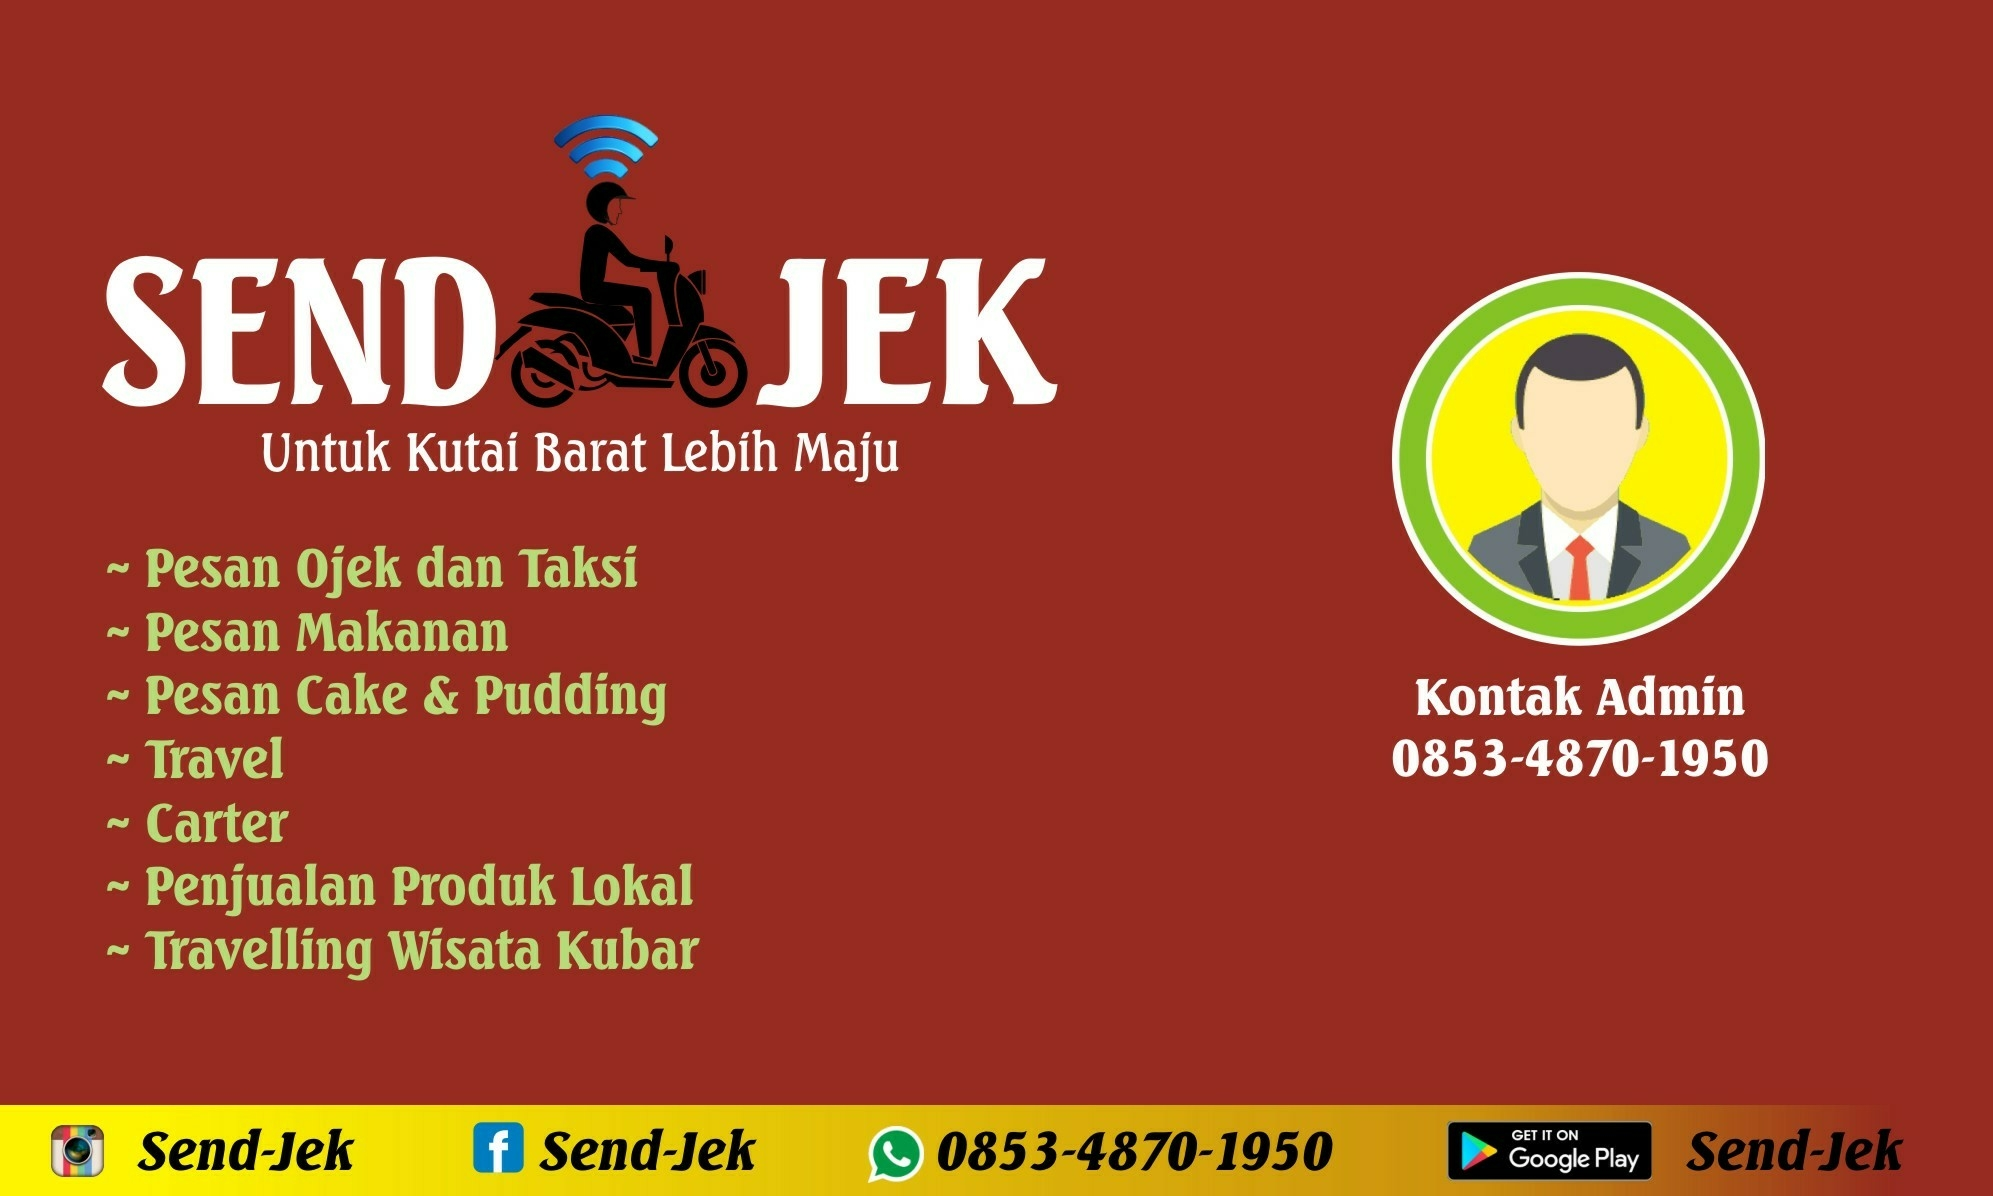 Send-Jek 1